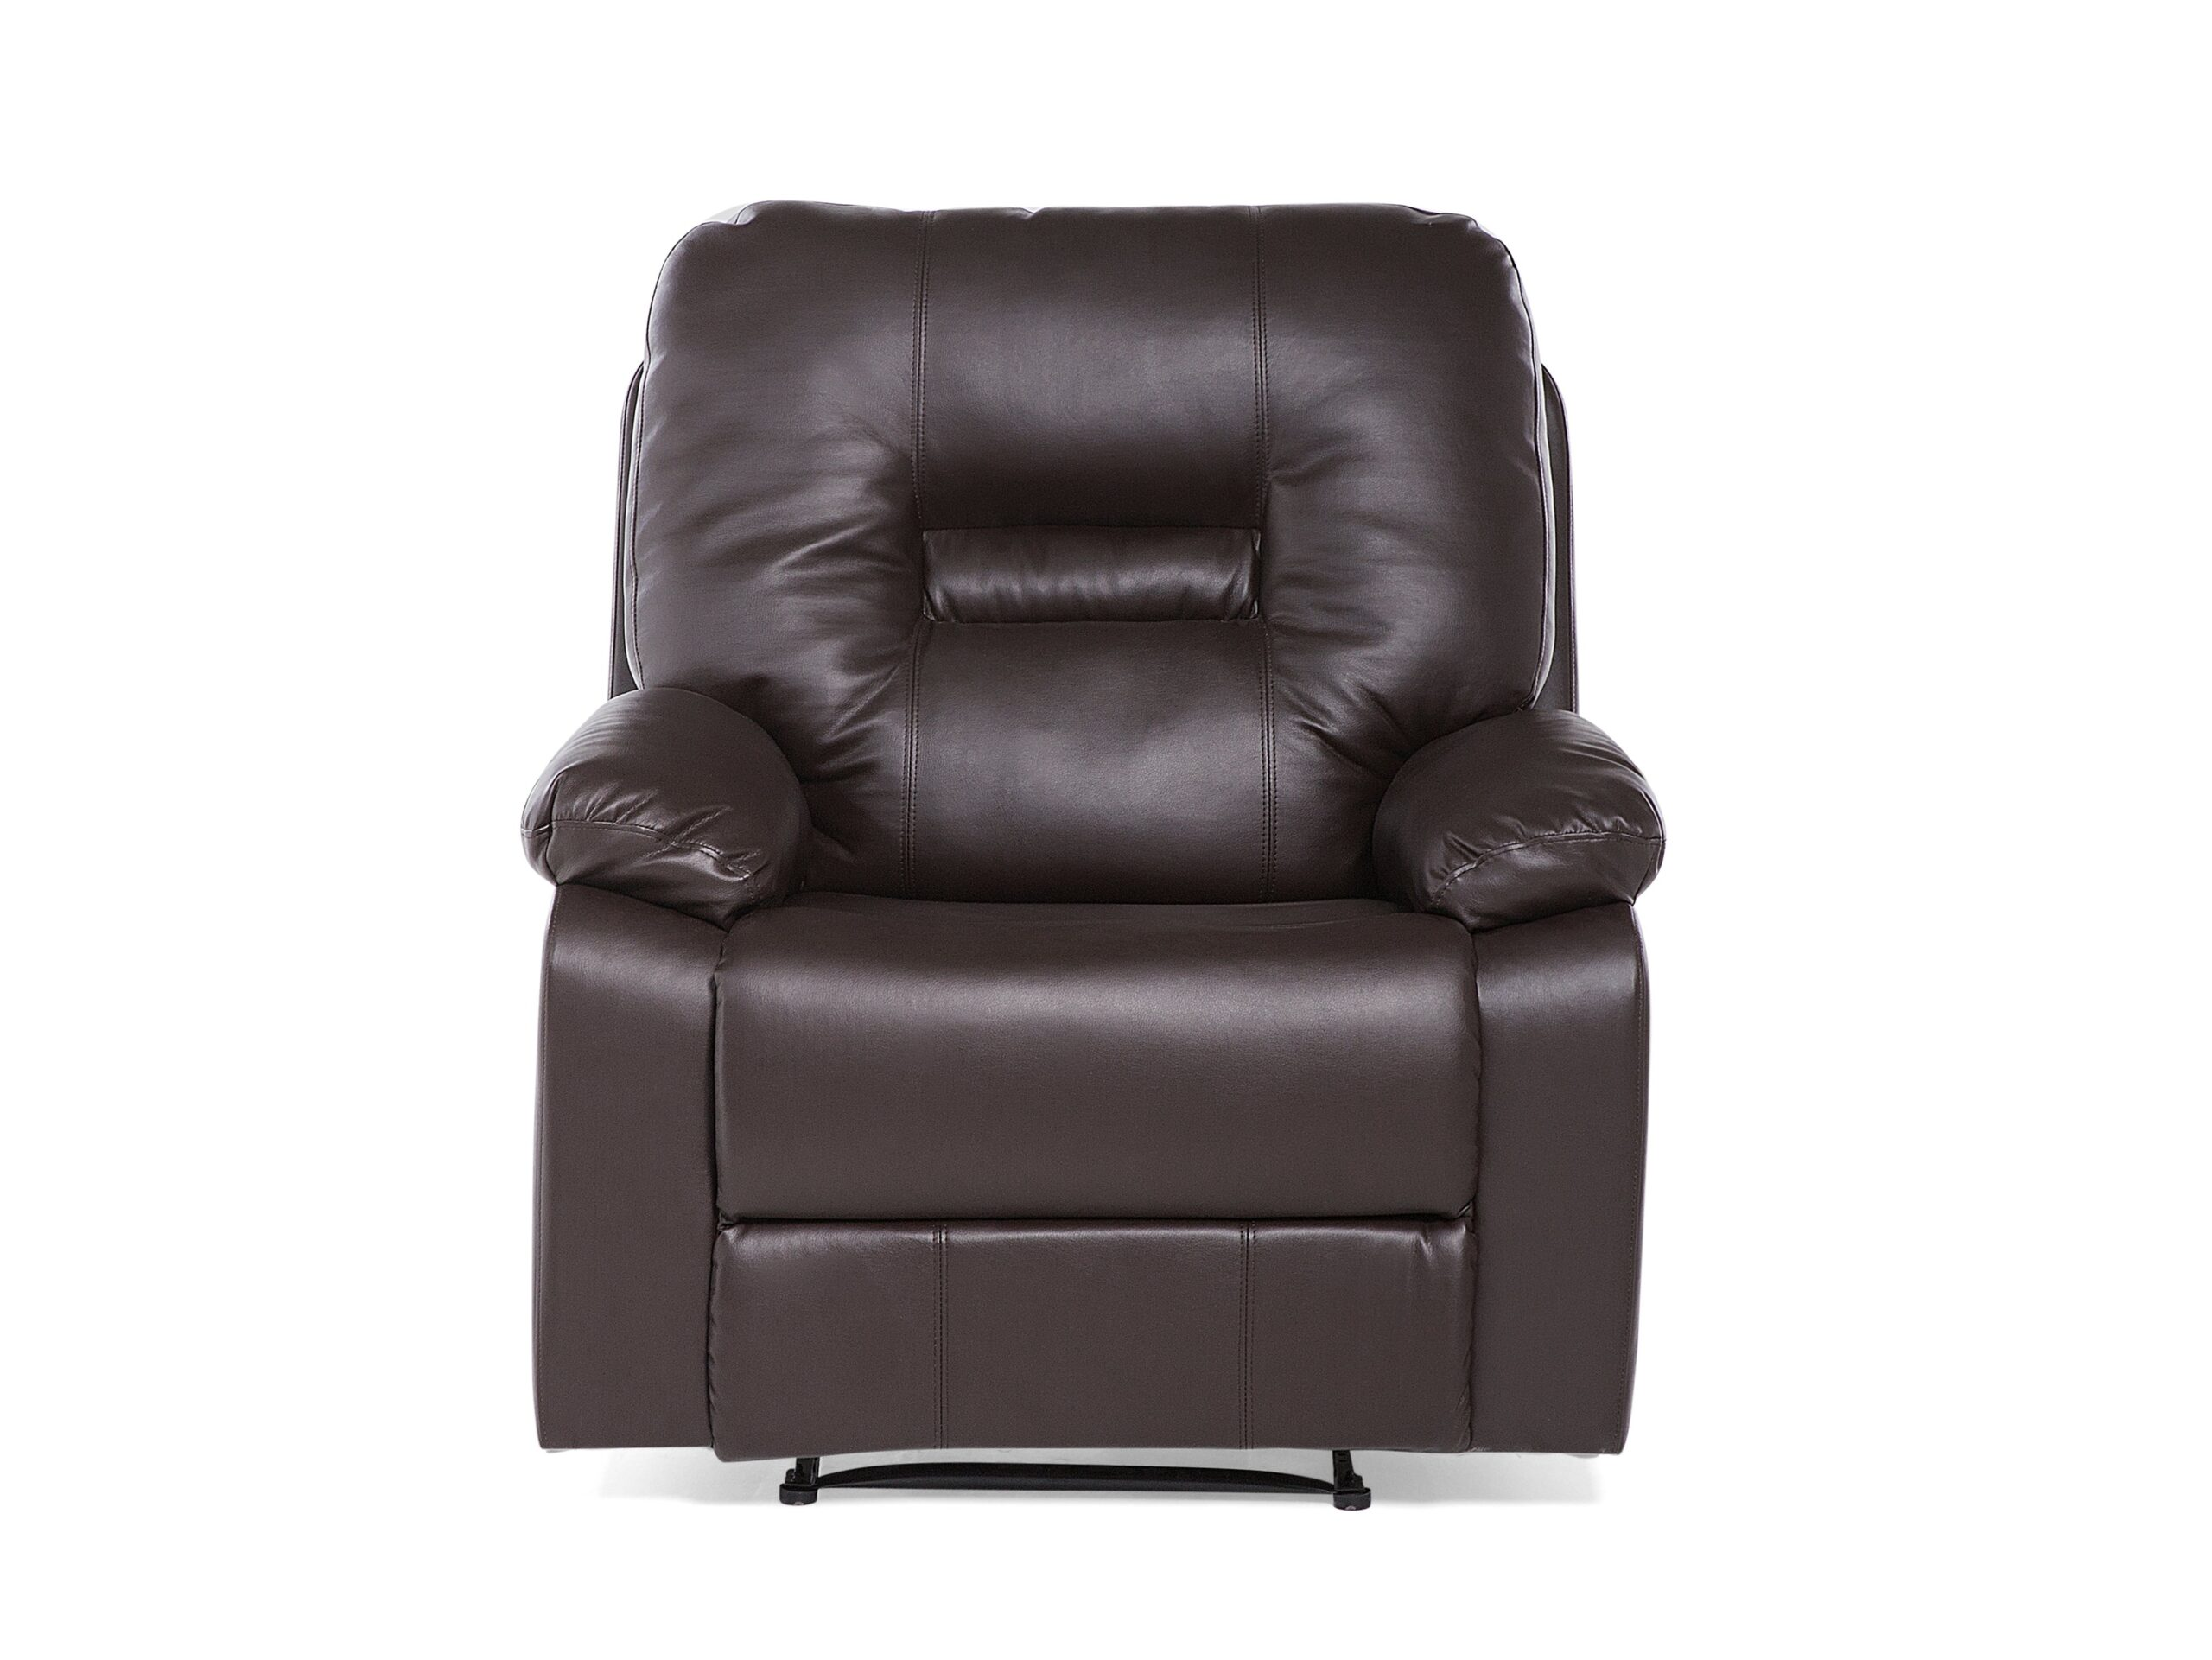 Full Size of Liegesessel Verstellbar Sessel Kunstleder Braun Bergen Belianide Sofa Mit Verstellbarer Sitztiefe Wohnzimmer Liegesessel Verstellbar